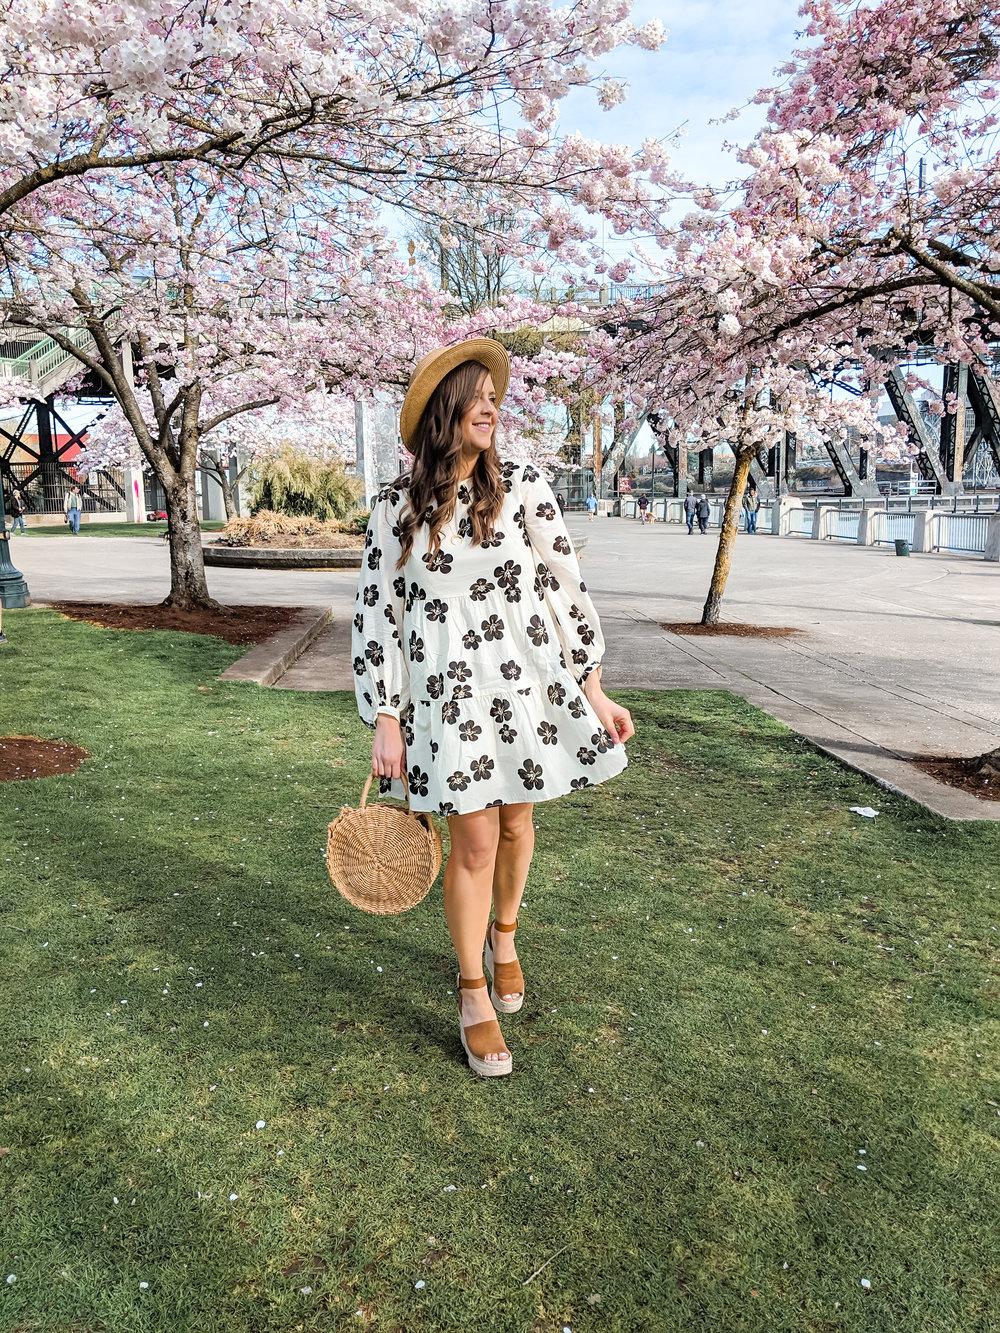 Floral Target Dress Cherry Blossoms